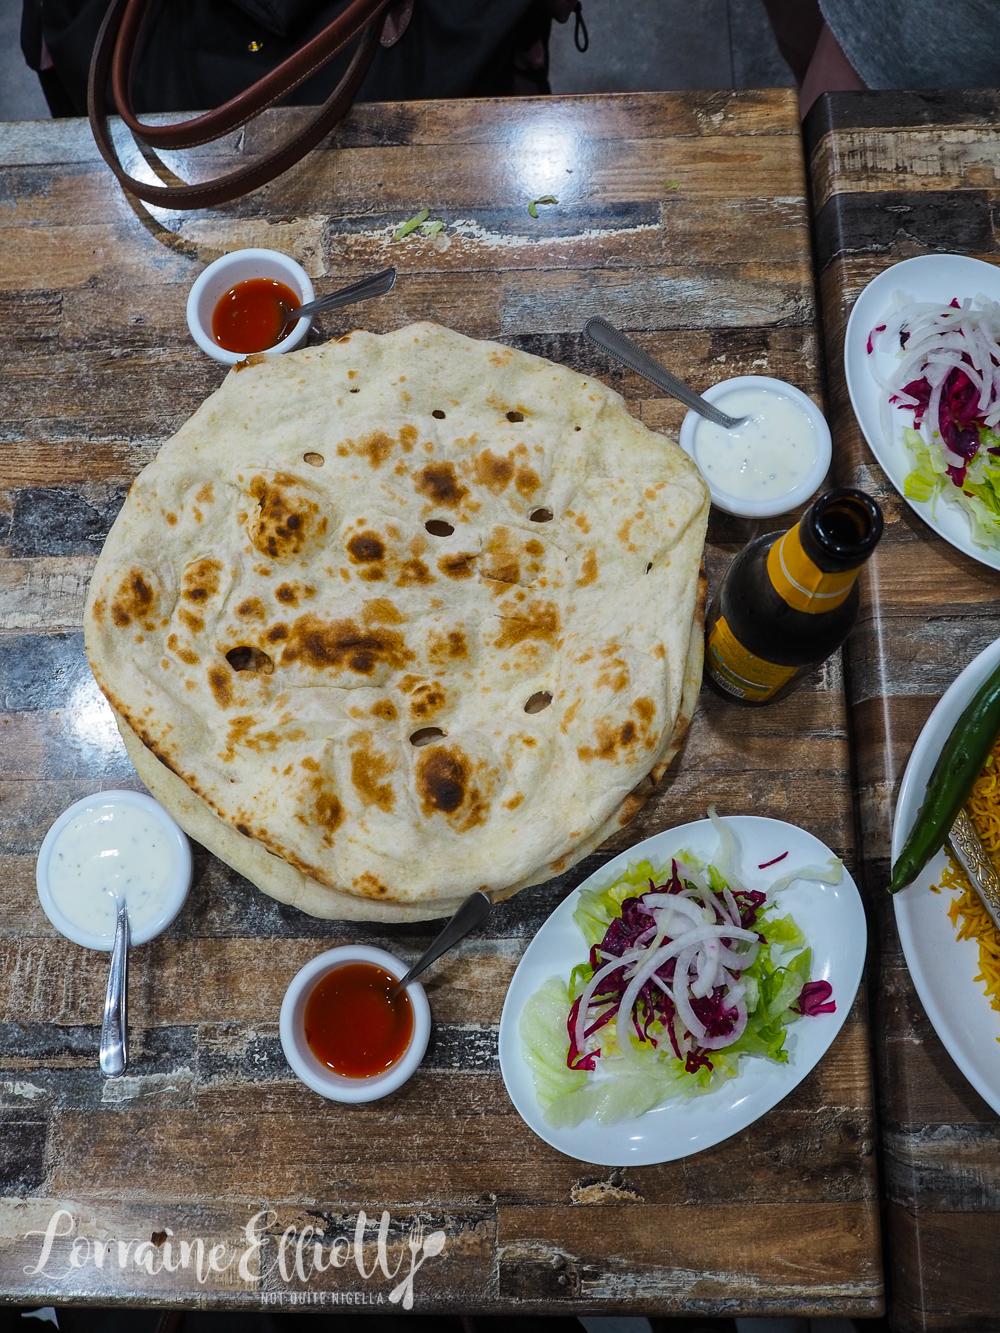 Merrylands Food Tour Where To Eat Restaurants